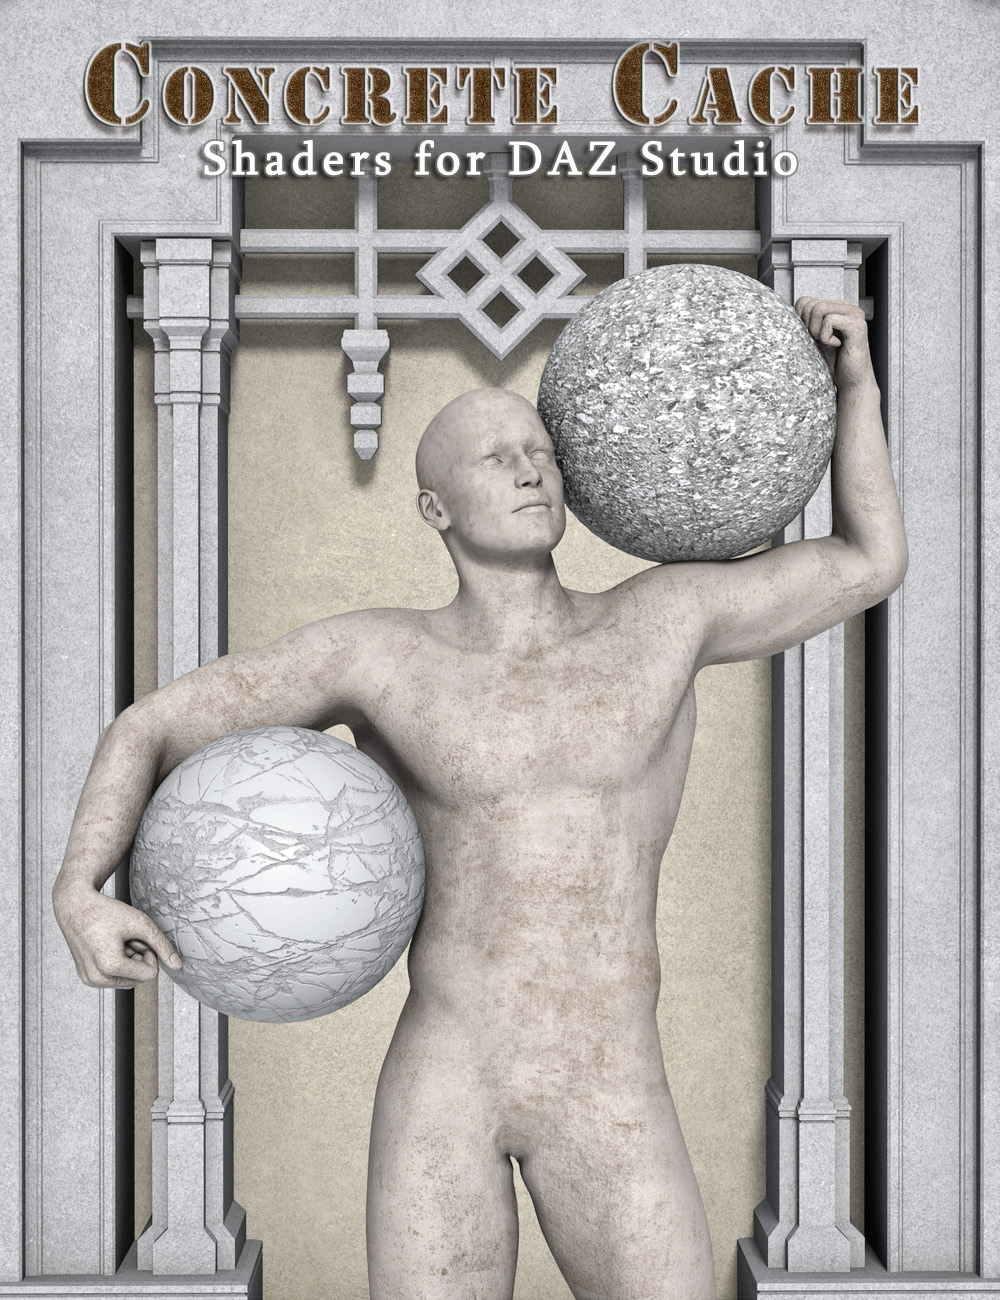 Concrete Cache - Shader Presets for DAZ Studio by: Eva1, 3D Models by Daz 3D